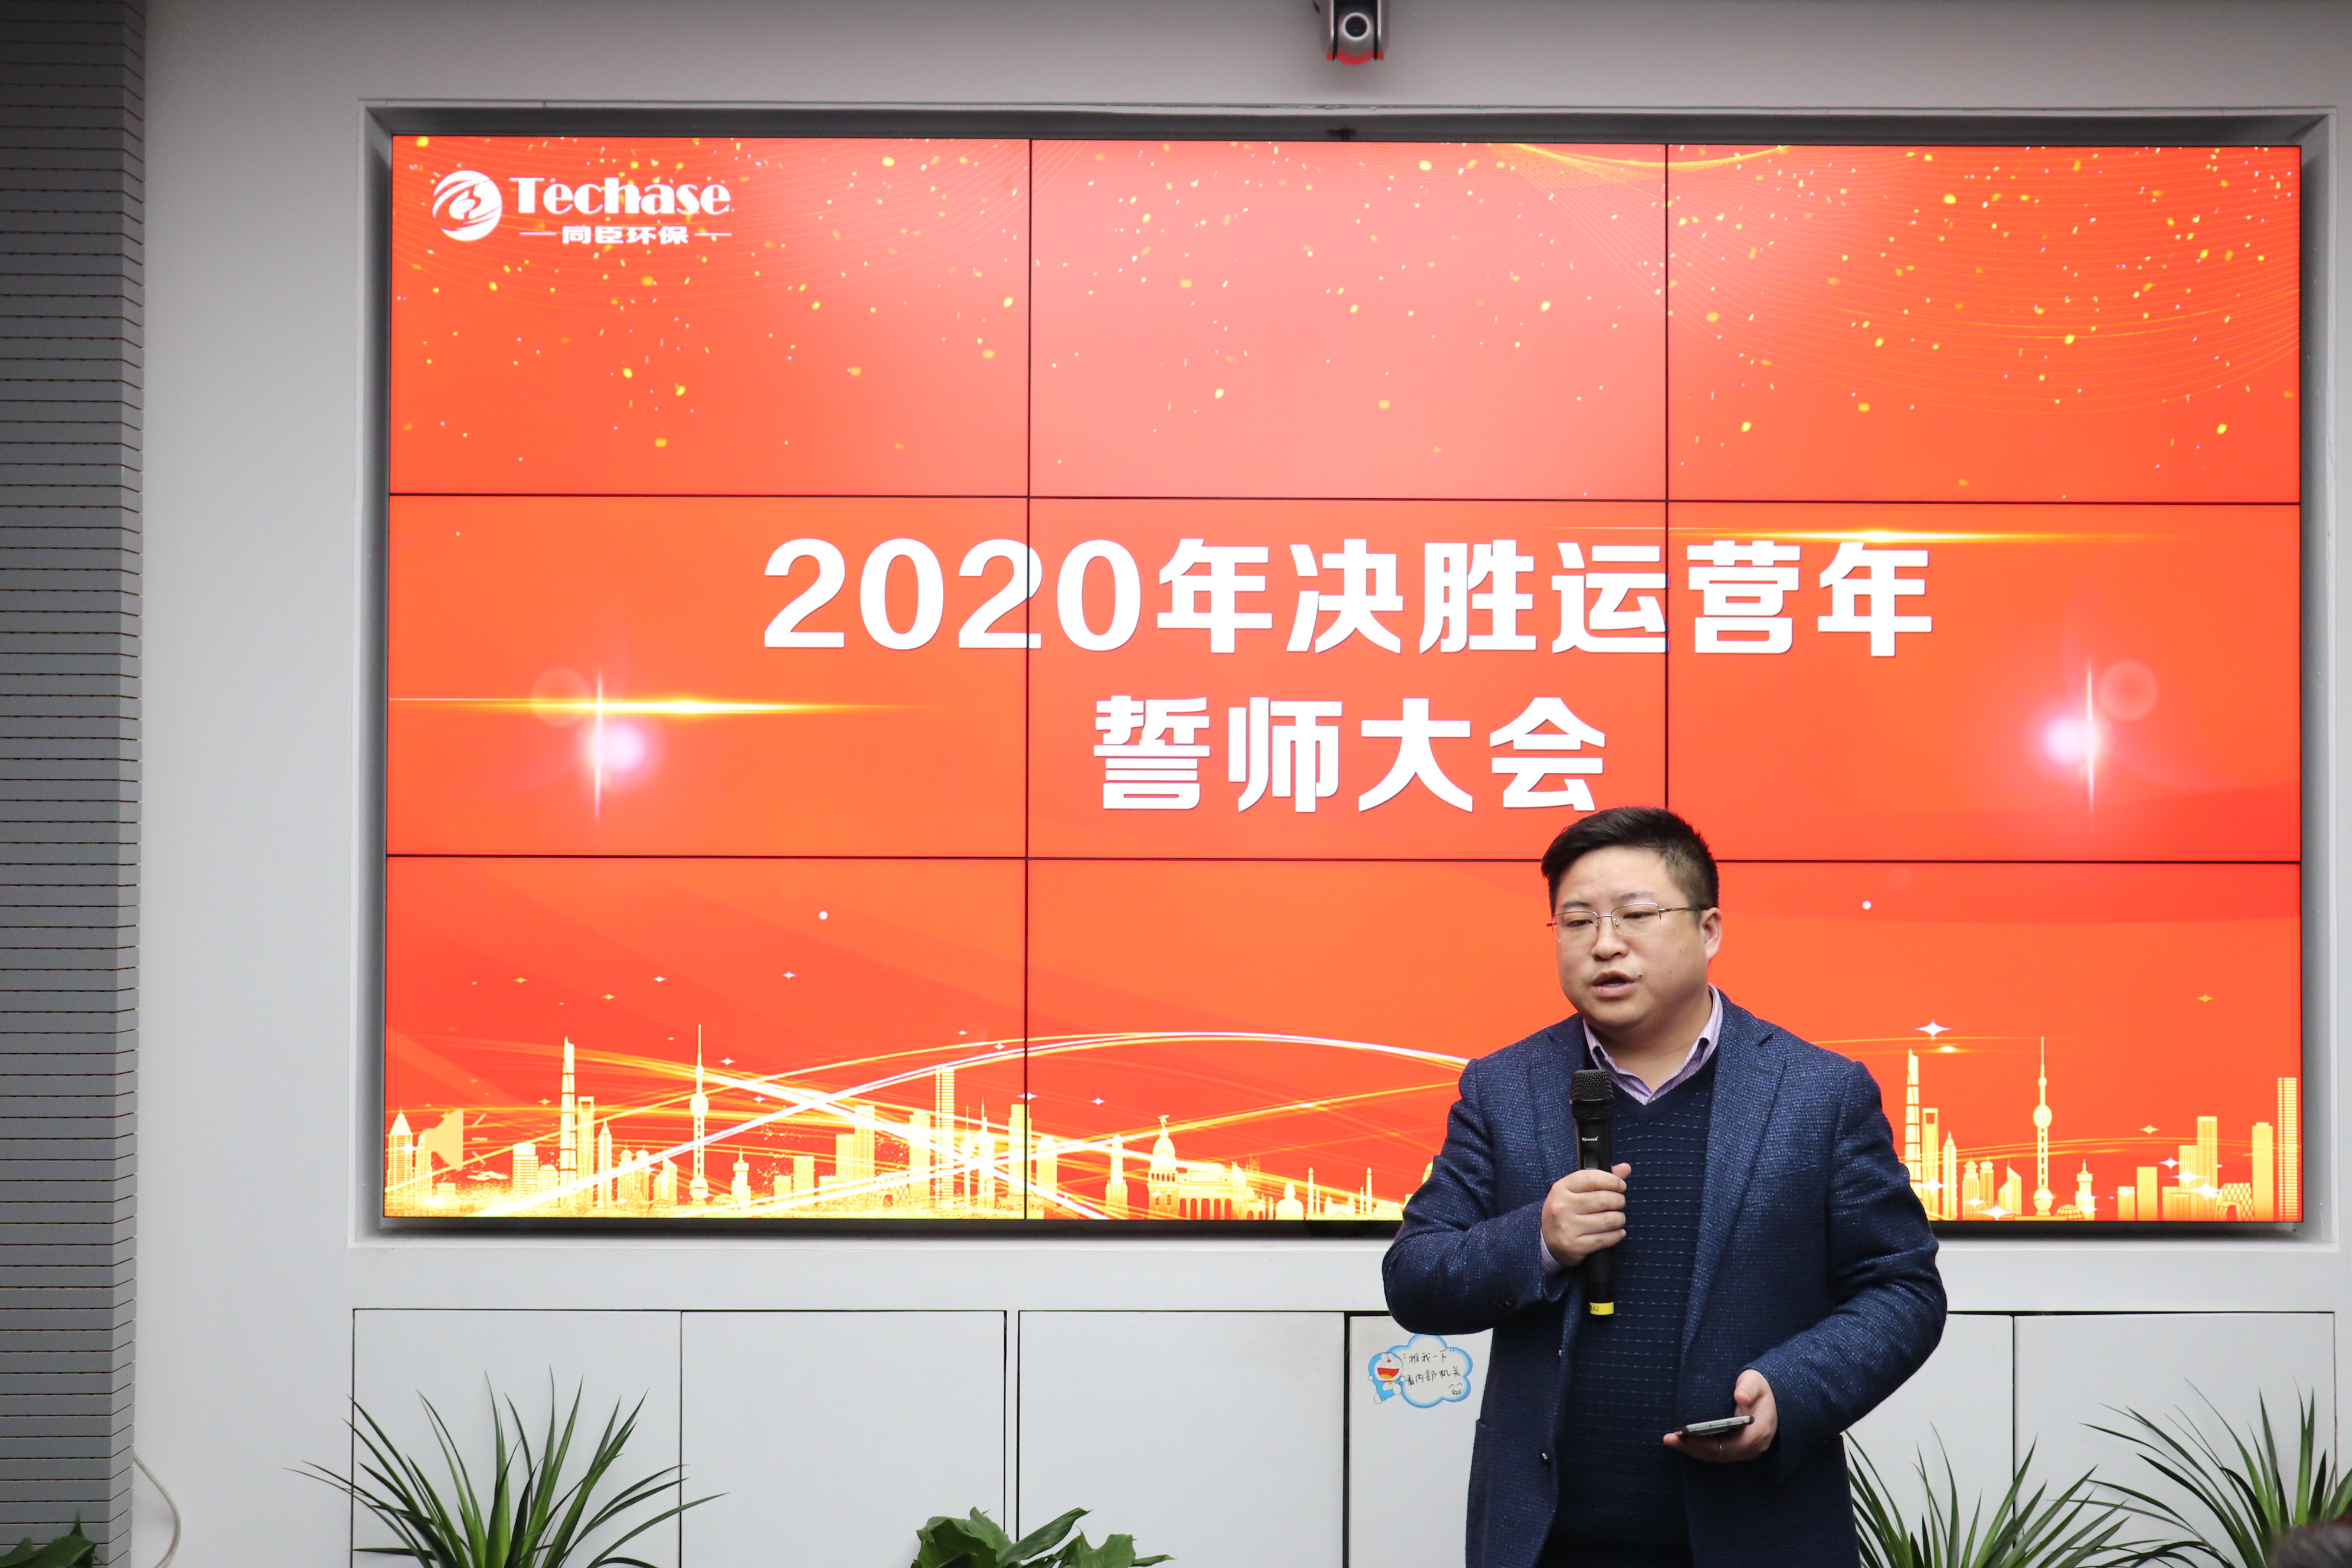 <b>新利官方网站下载动态 2020决胜运营年誓师大会胜利召开</b>